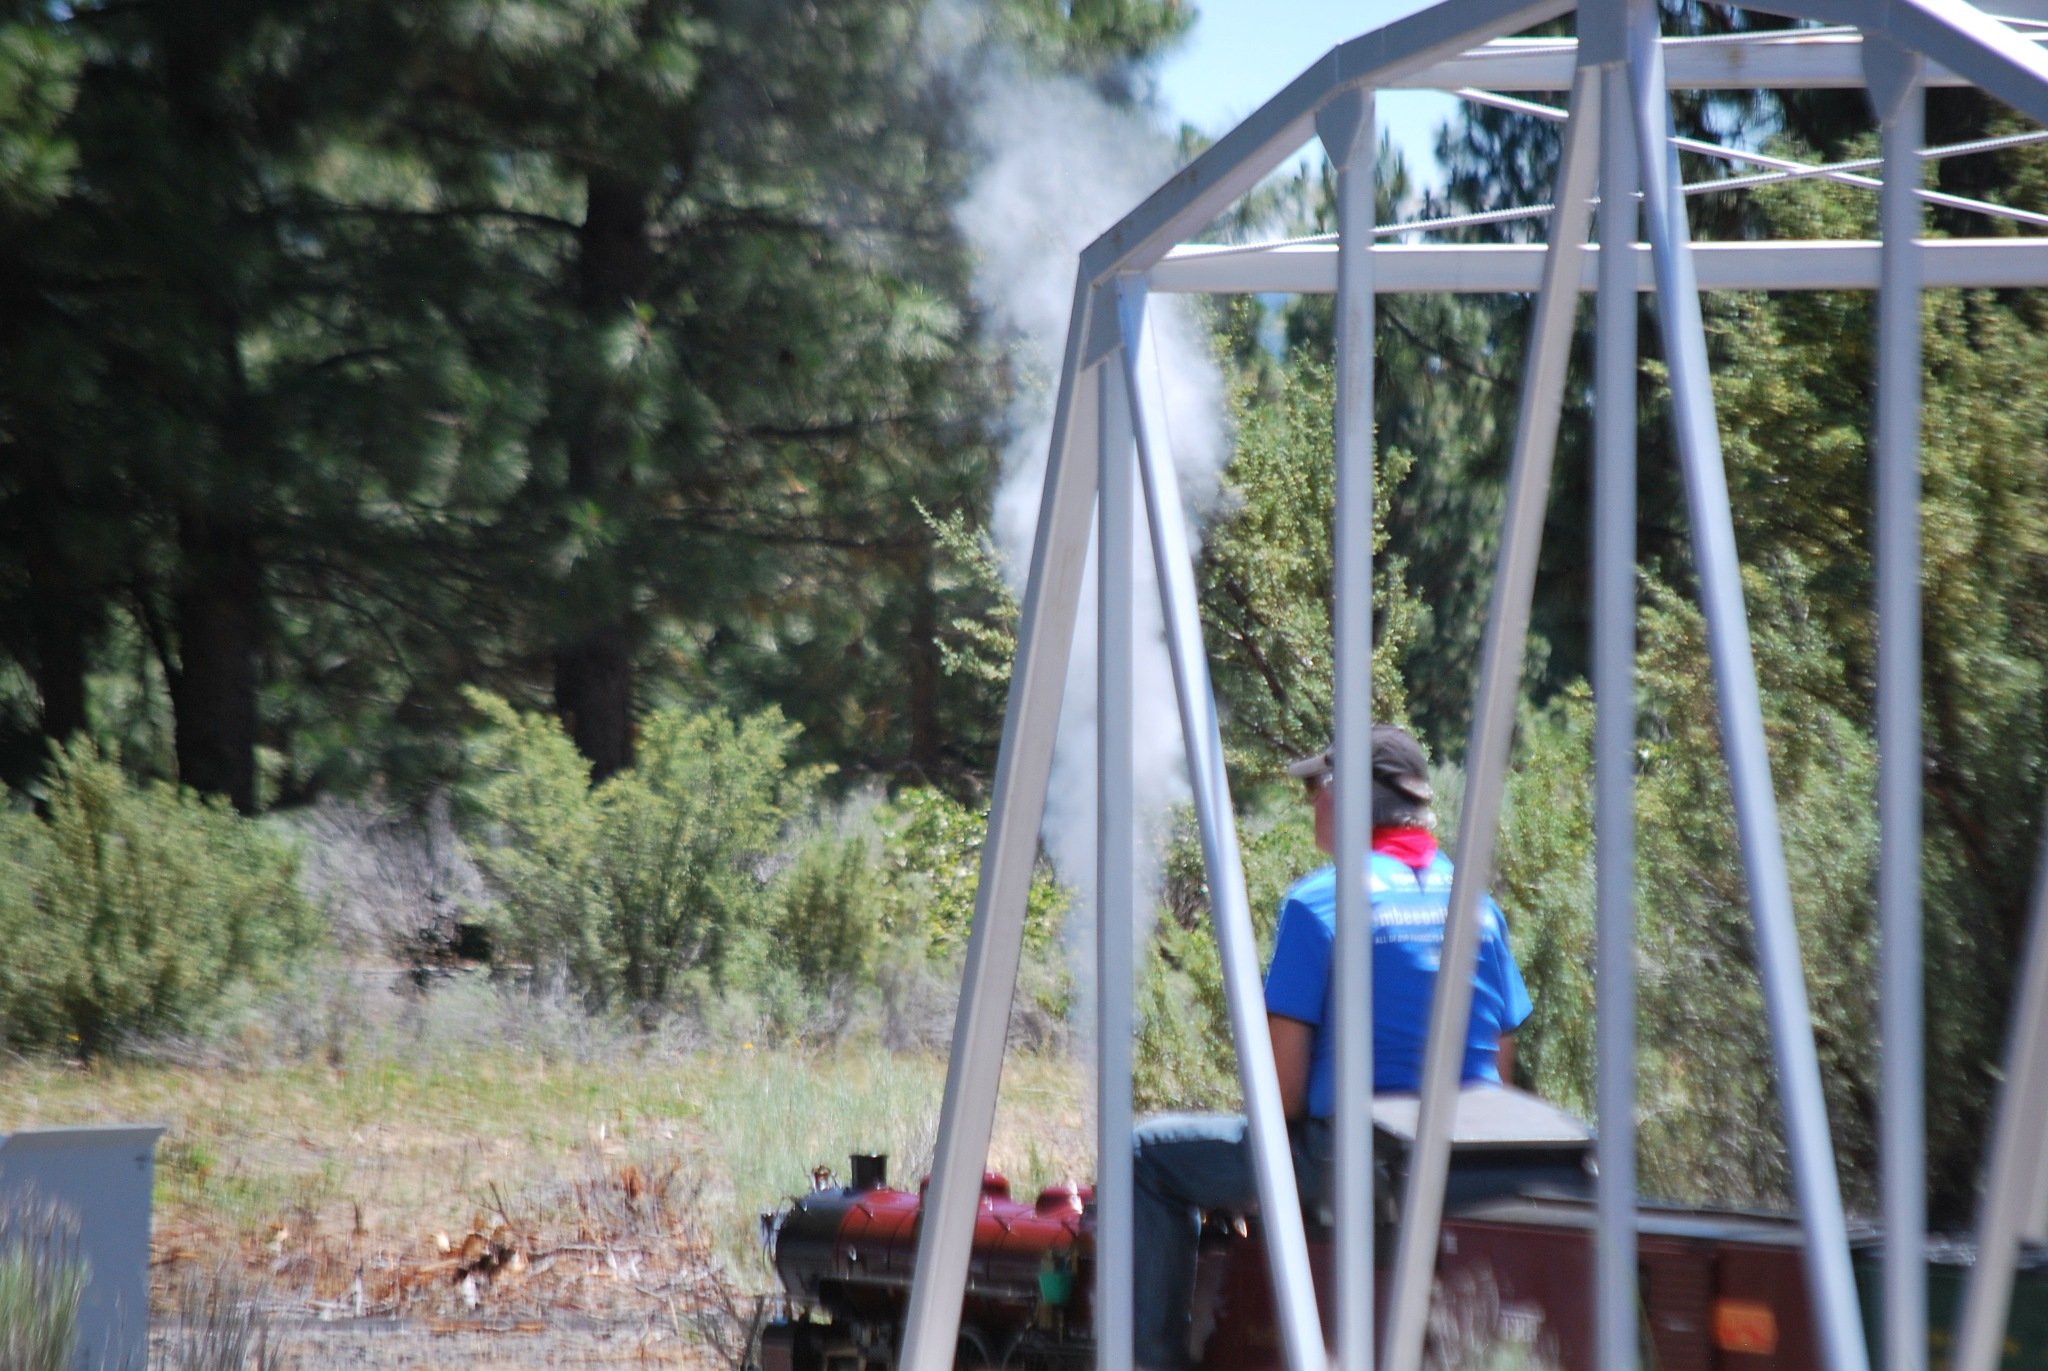 The steam Engine by marilyn wirtz